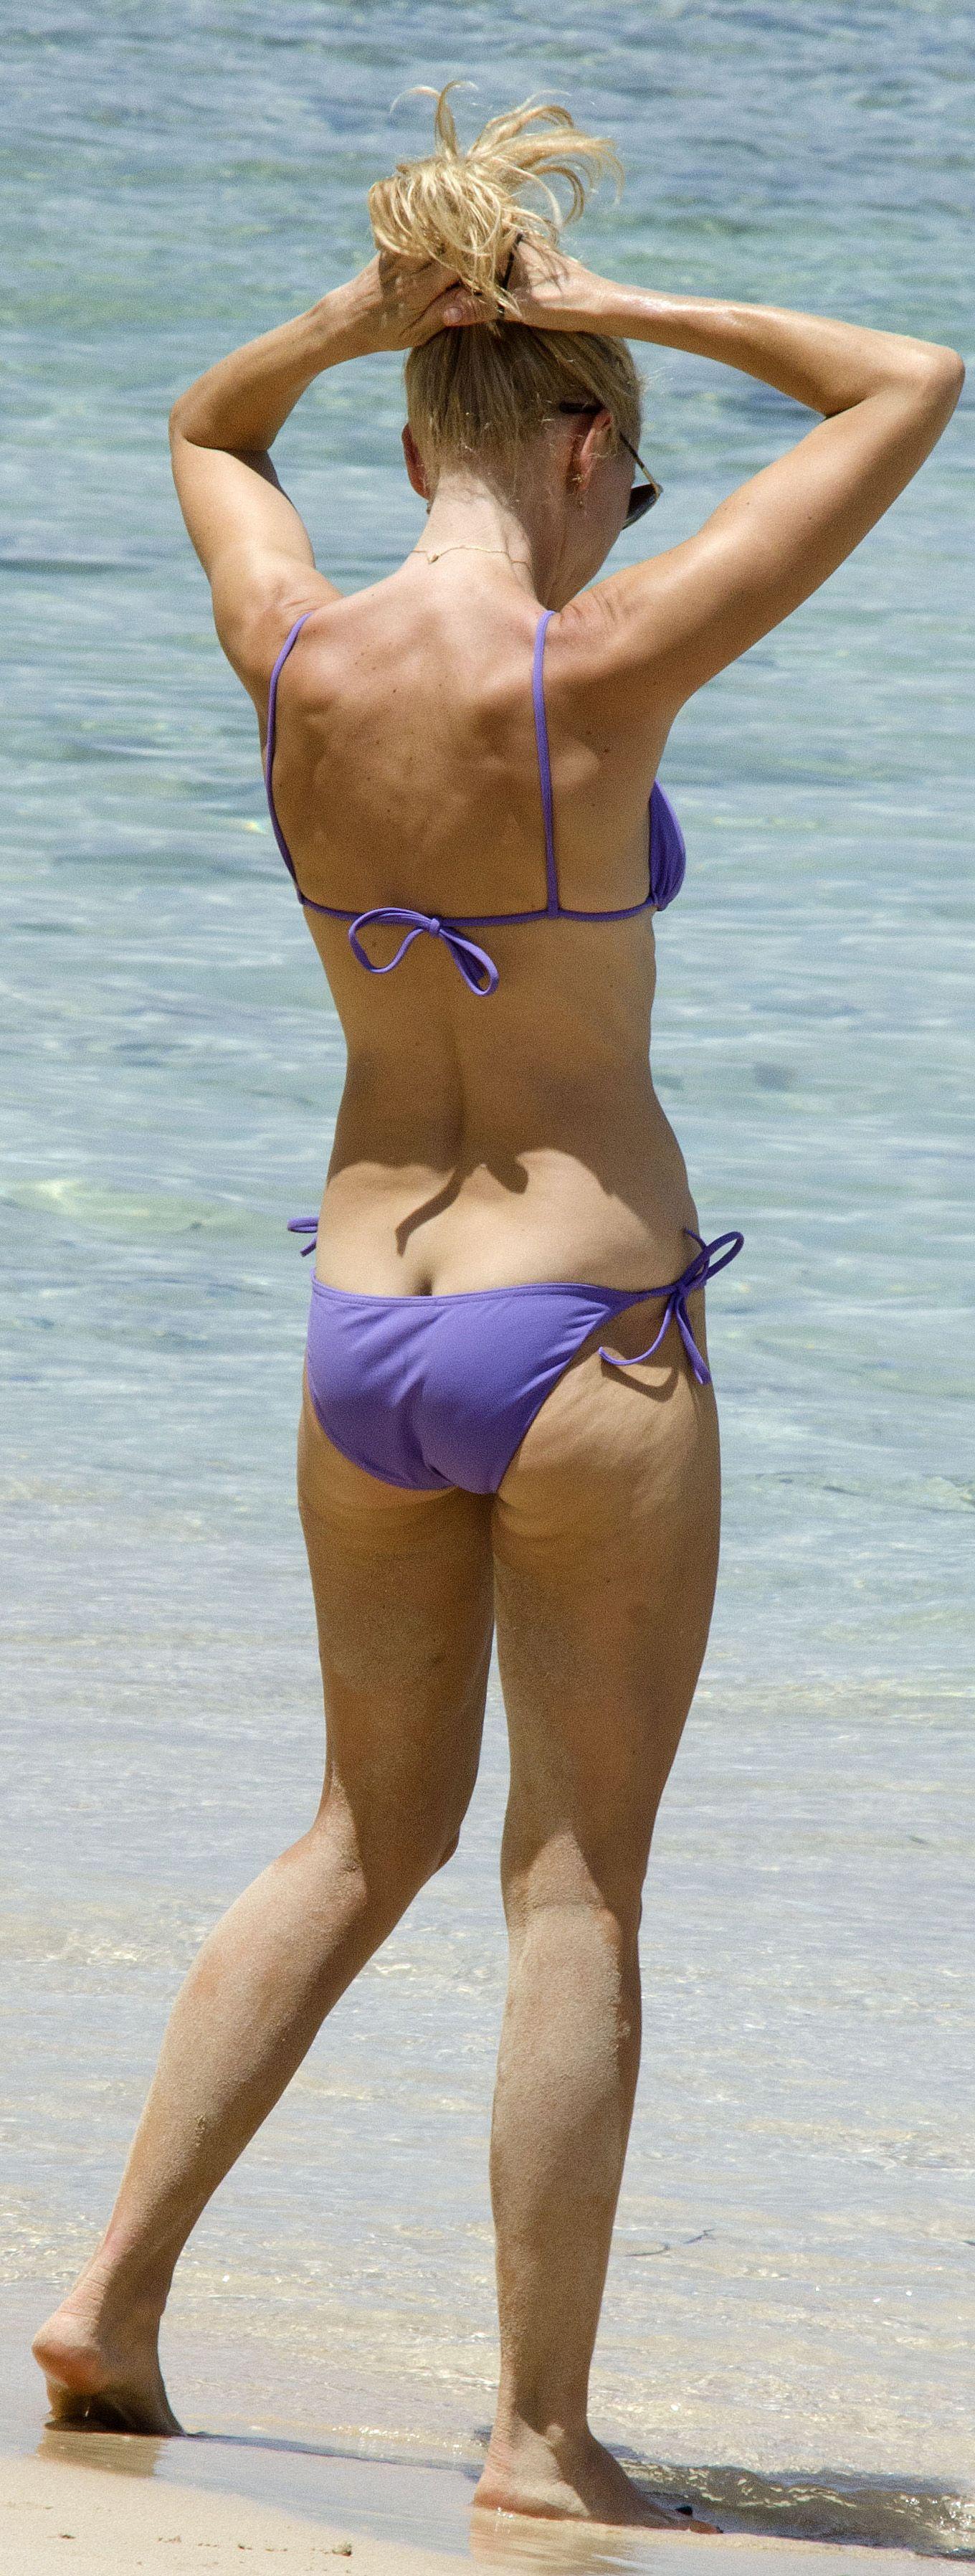 Bikini in naomi watt